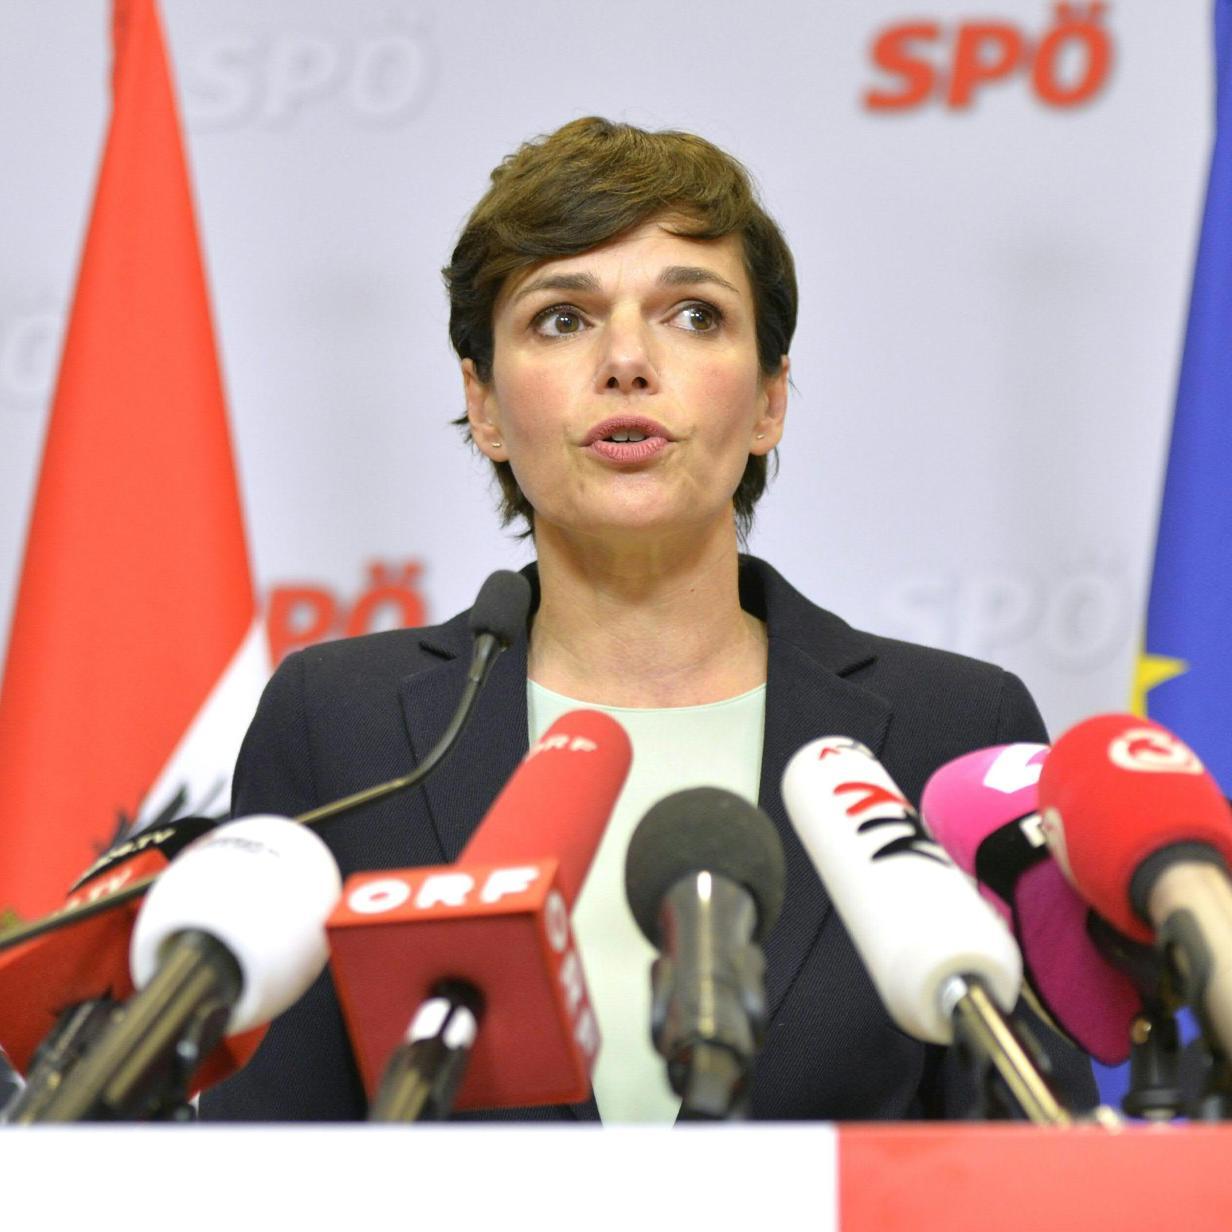 Stellungnahme: Rendi-Wagner attackiert Kanzler Kurz